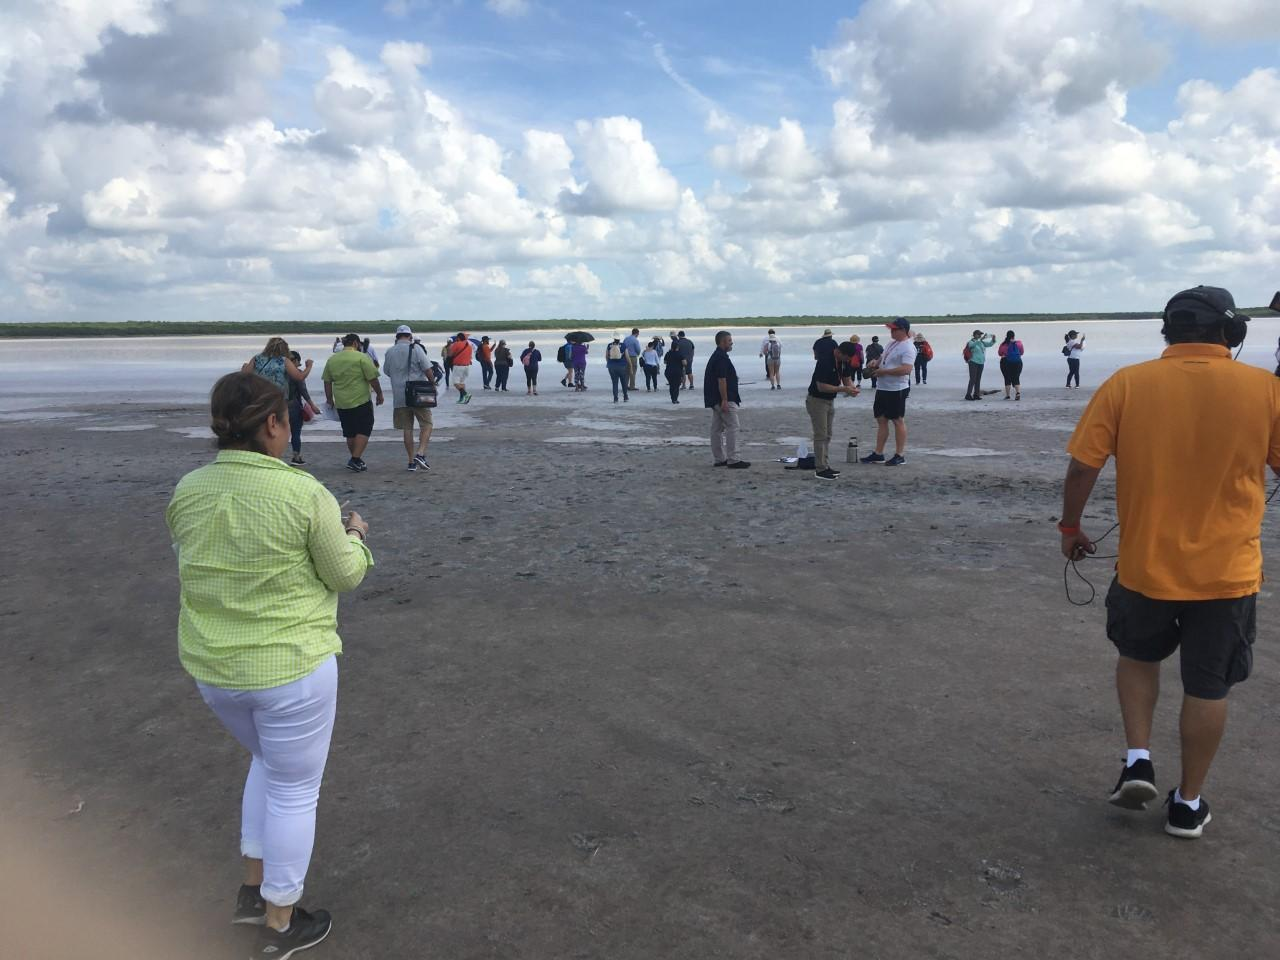 Teachers doing an activity on the lake shore